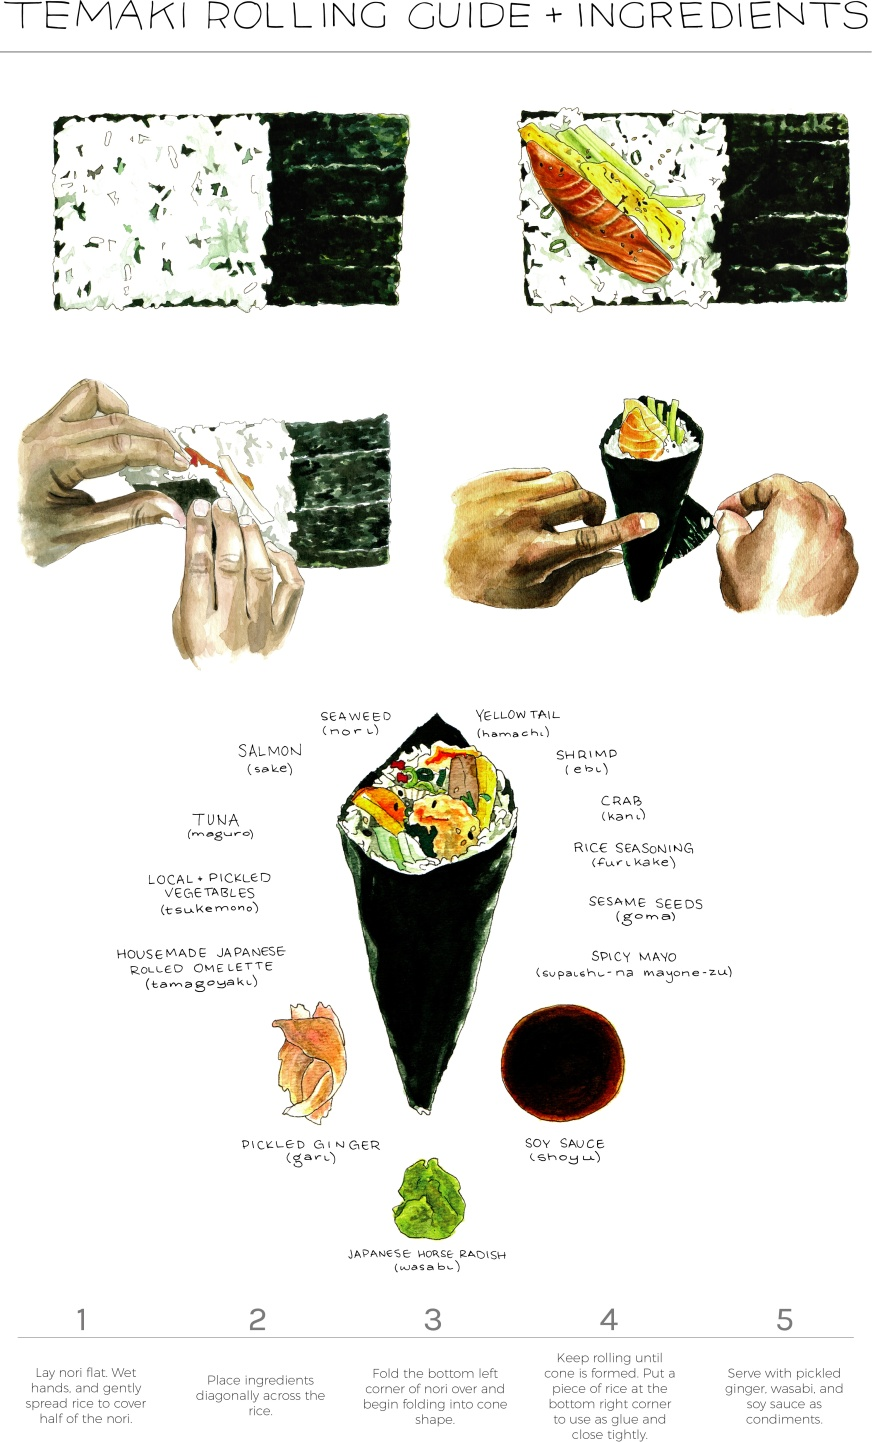 temaki-illustration-18x11